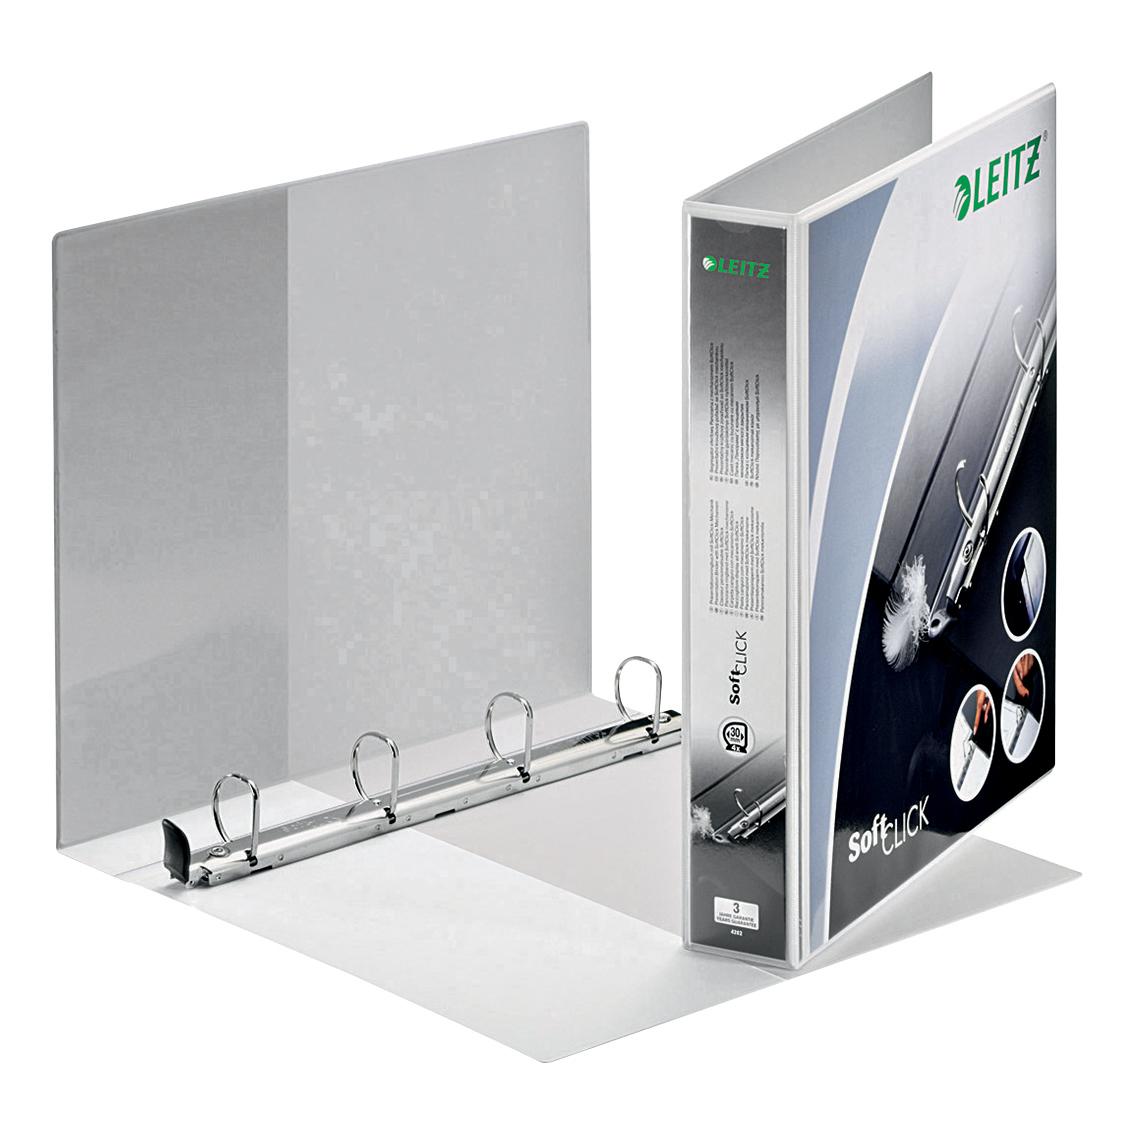 Leitz Softclick Presentation Ring Binder Polypropylene 4 D-Ring 30mm A4 White Ref 42020001 Pack 6